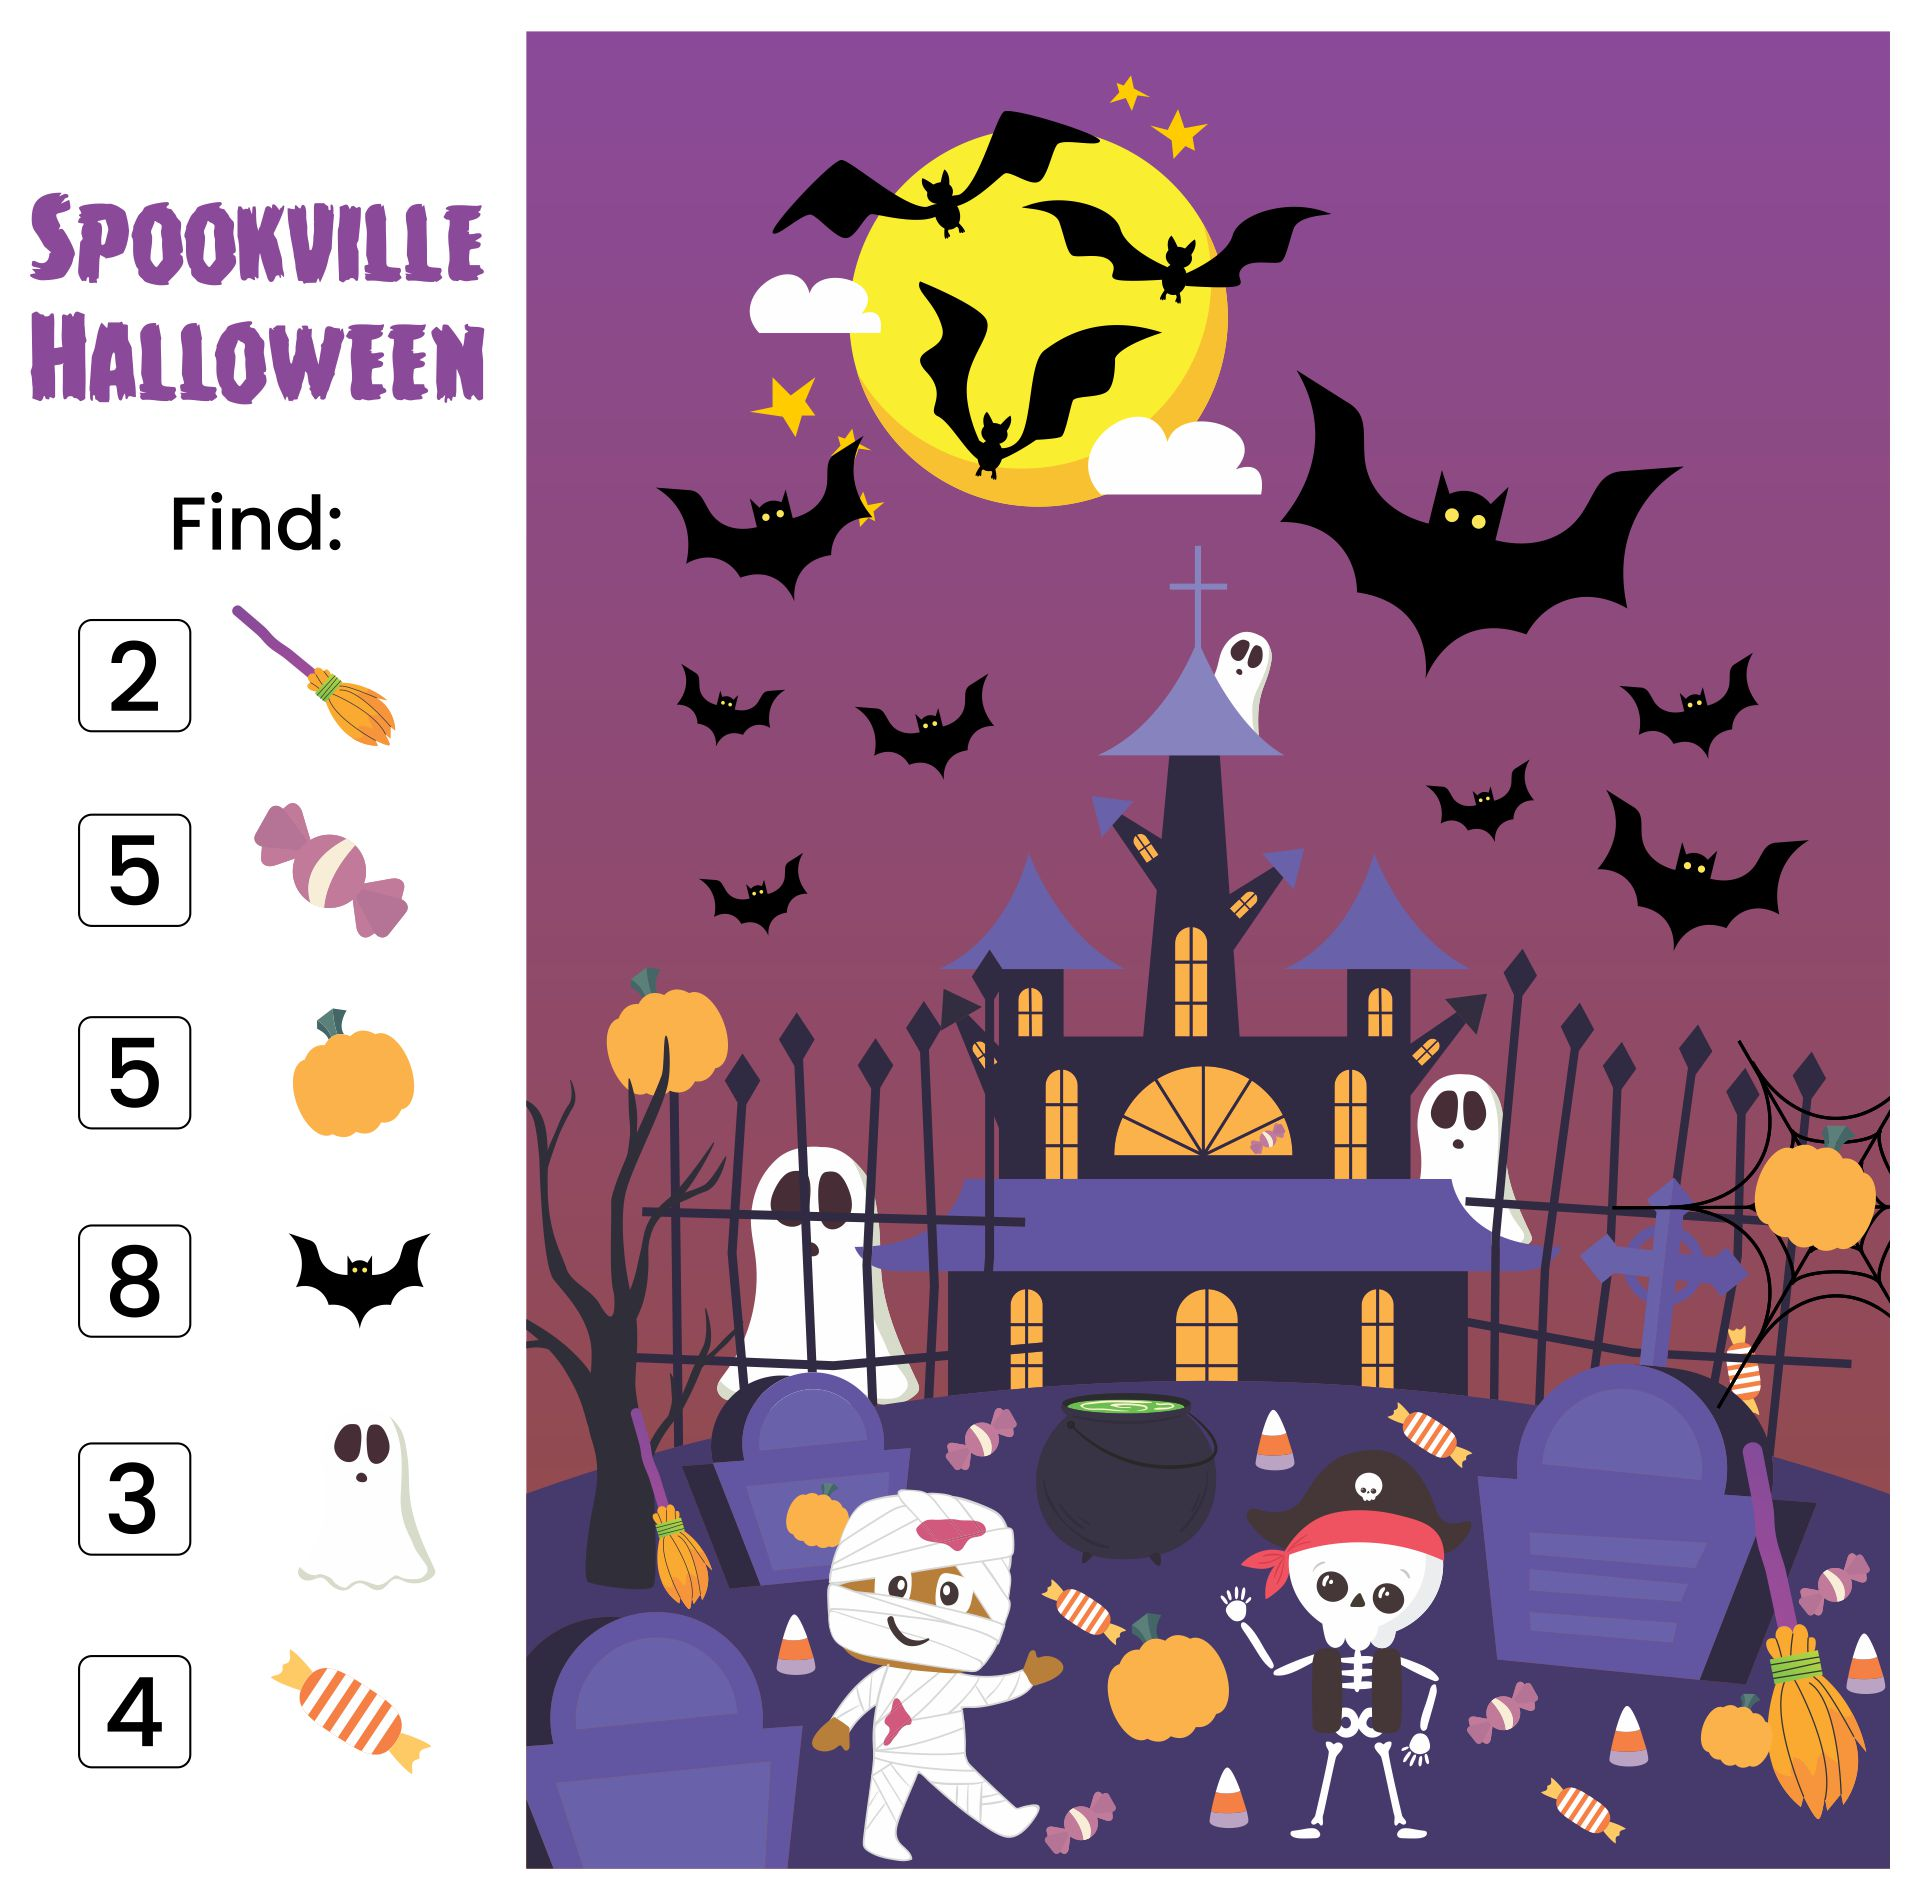 Free Spookville Halloween Printable